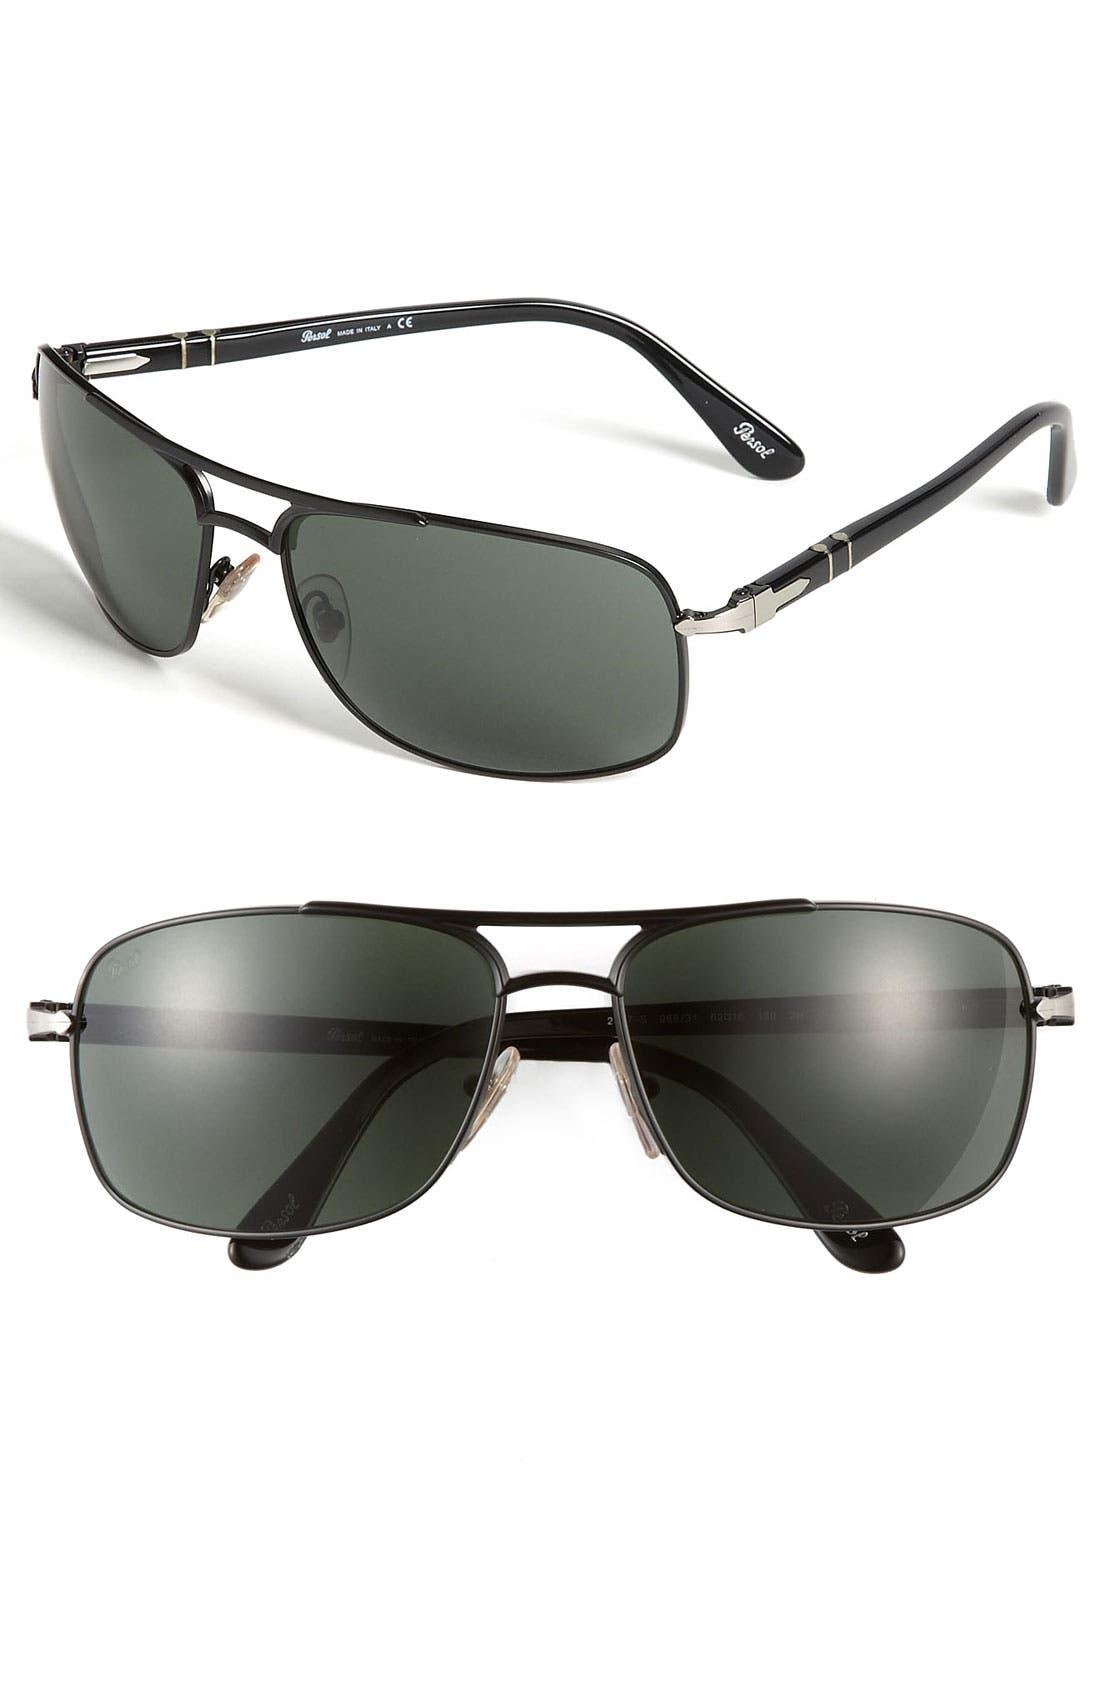 Main Image - Persol 62mm Sunglasses